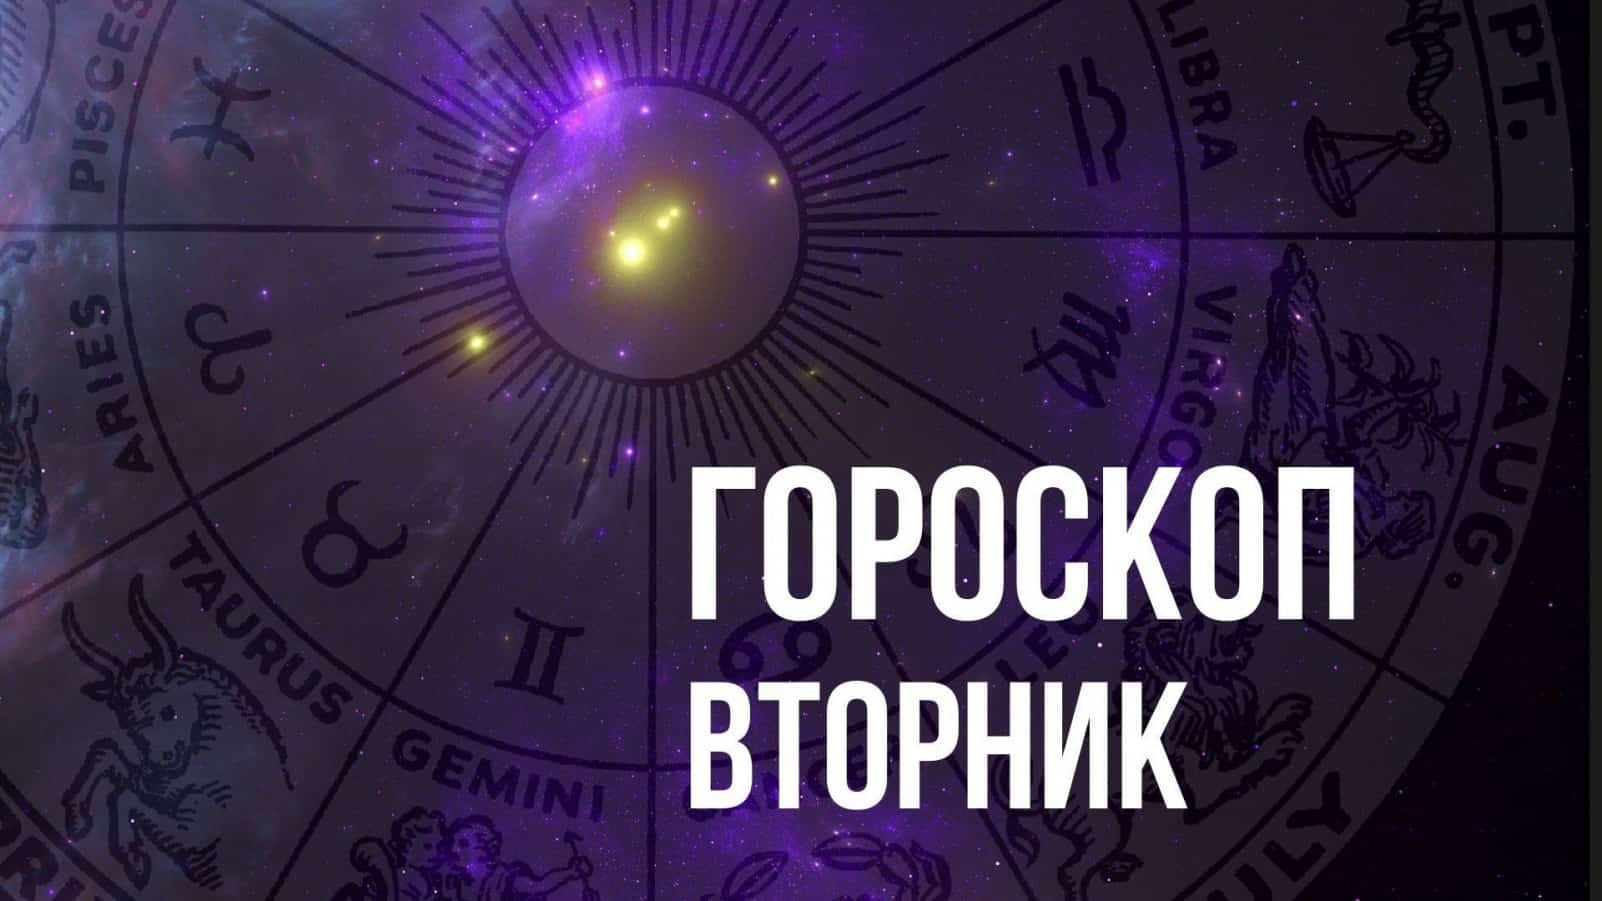 Гороскоп на вторник 8 июня для каждого знака Зодиака